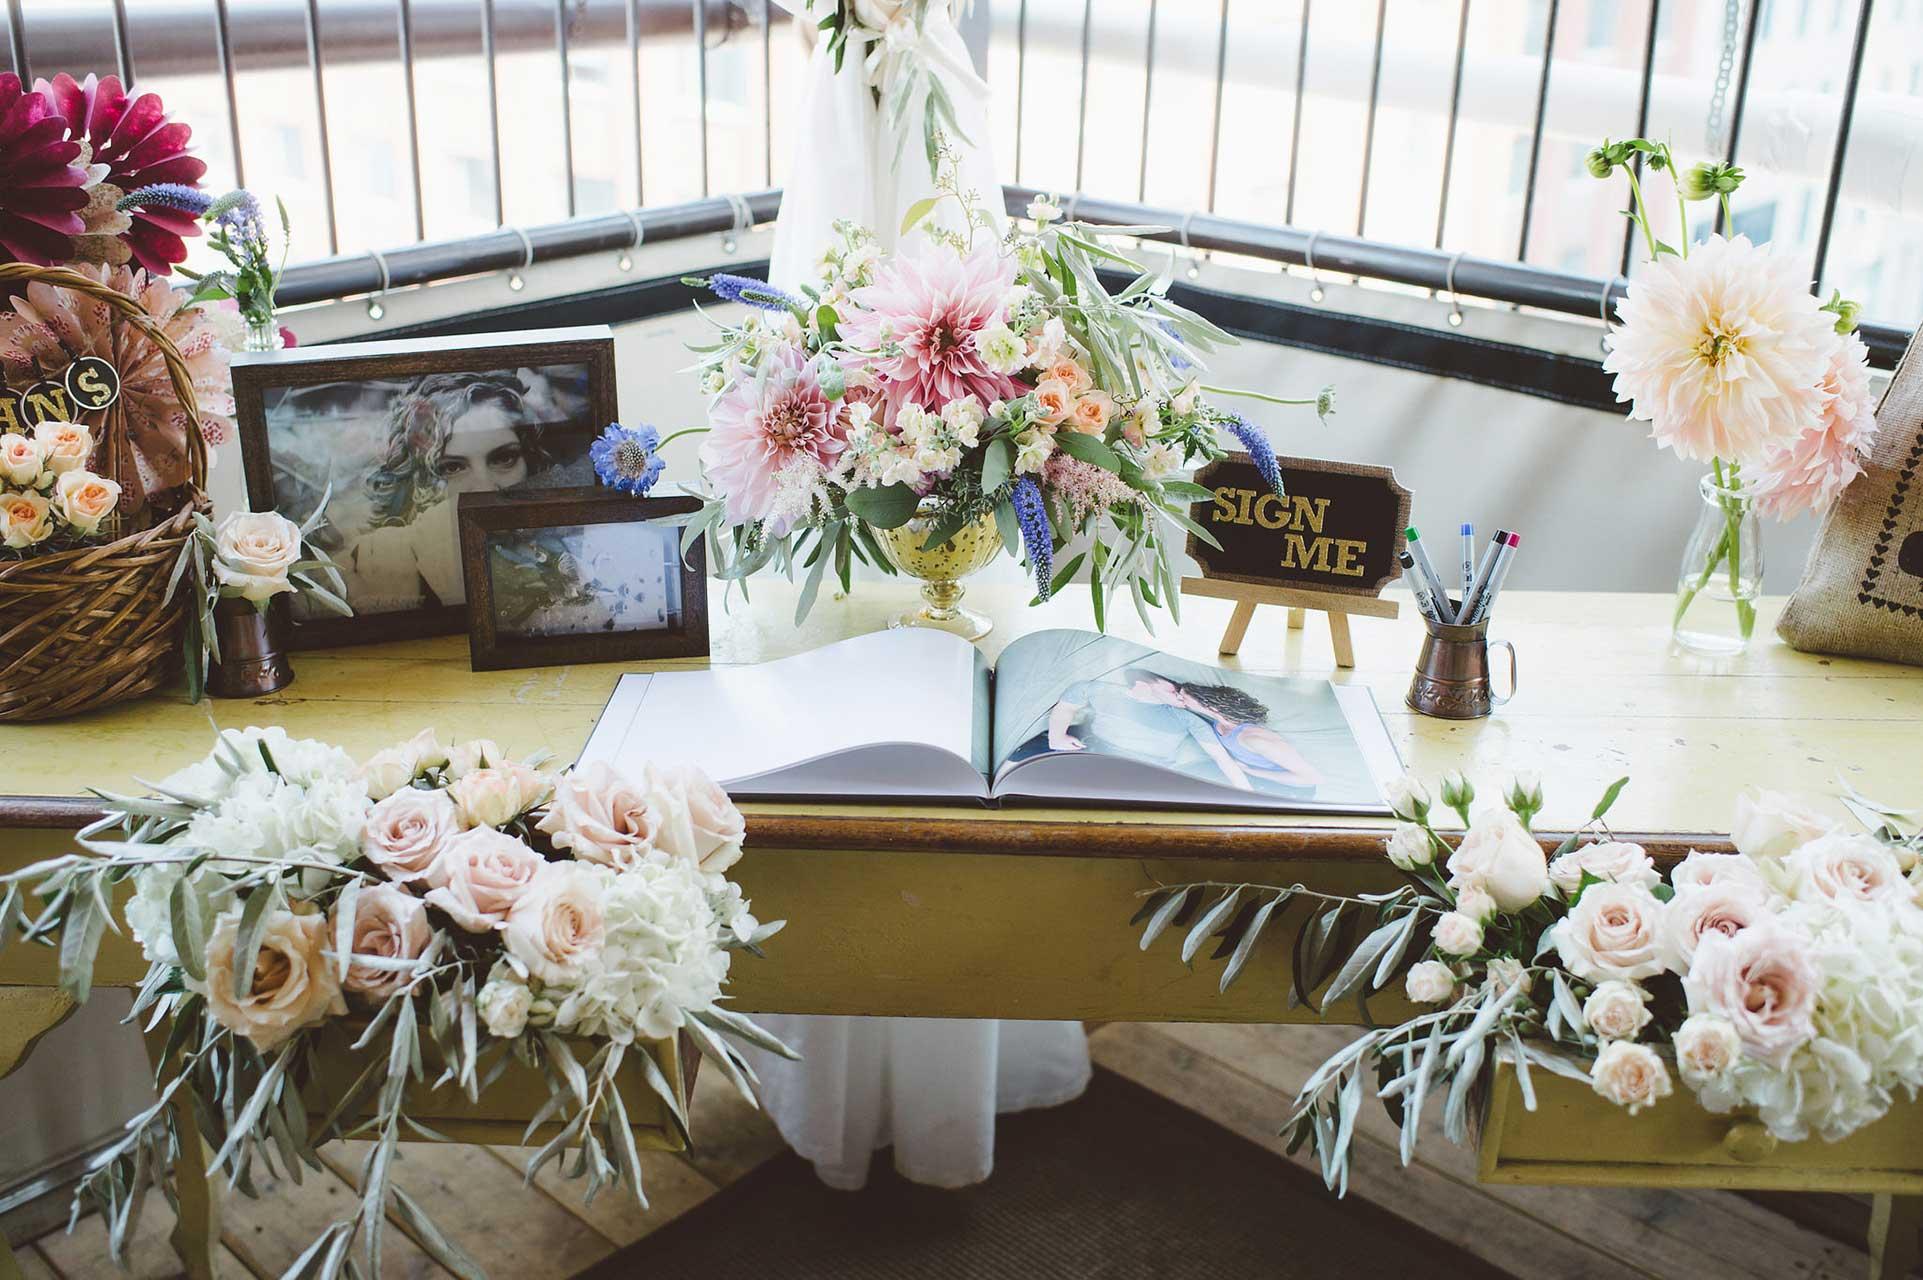 Wedding Venues Toronto - Wedding Guest Book - Vintage Wedding Flowers